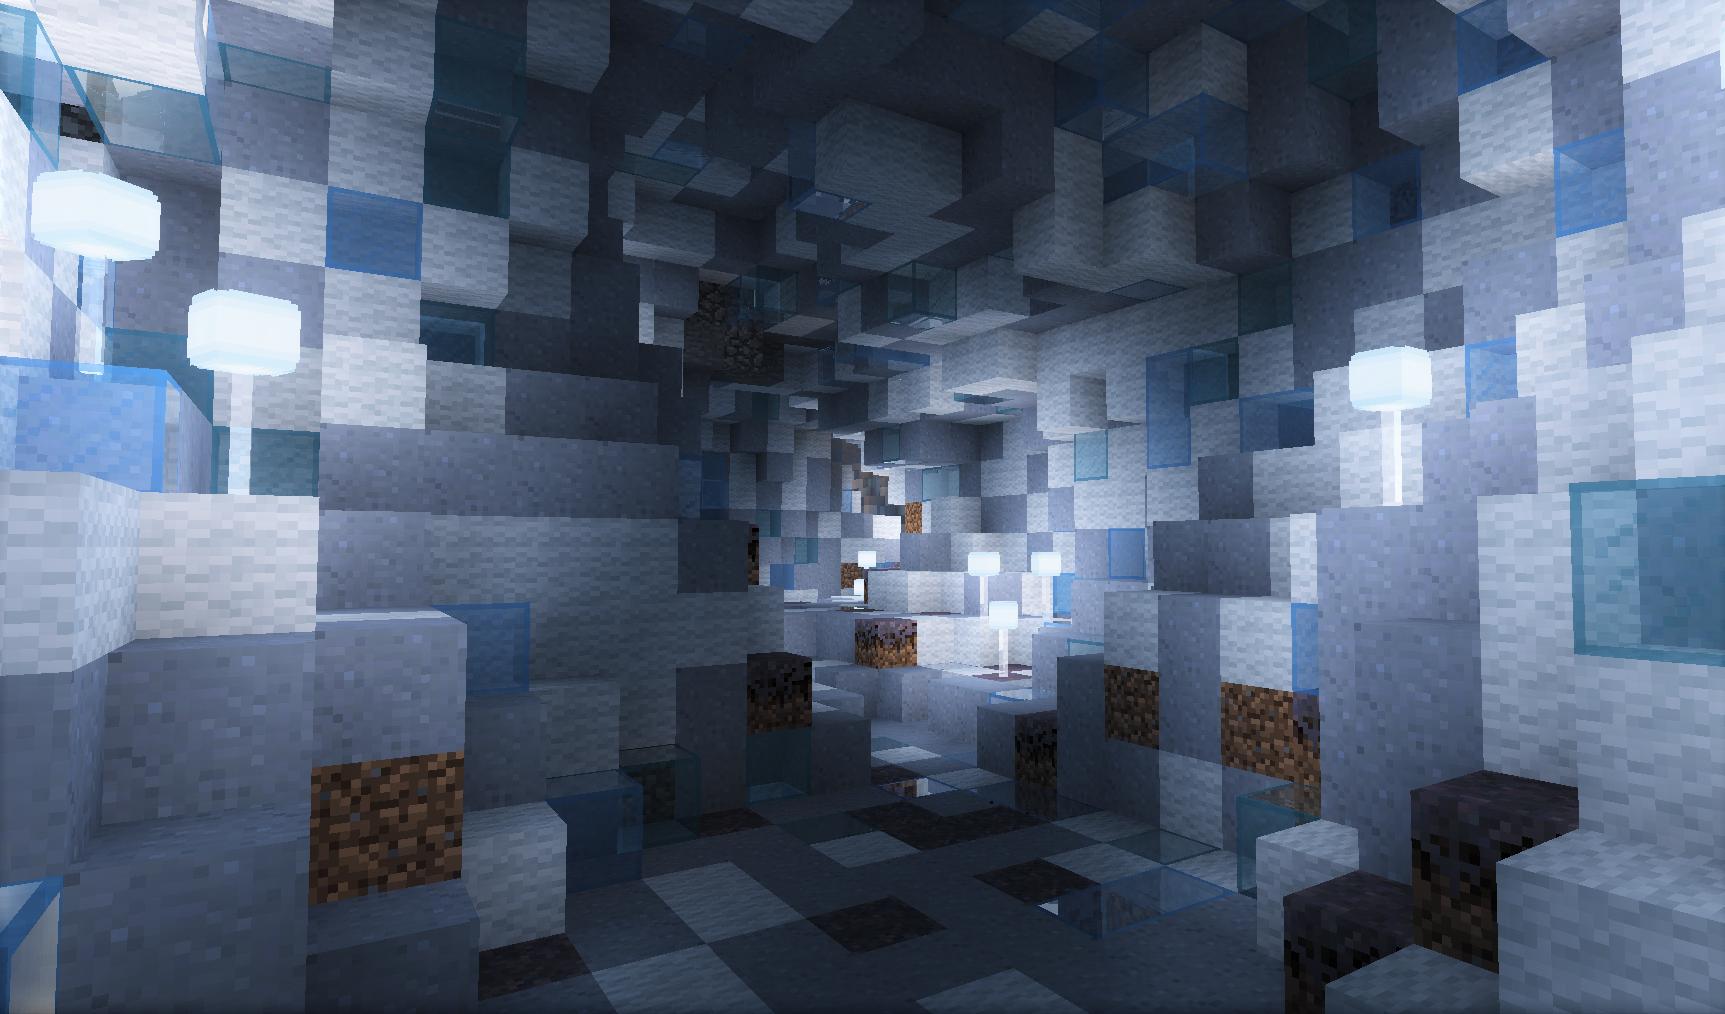 洞窟2.png